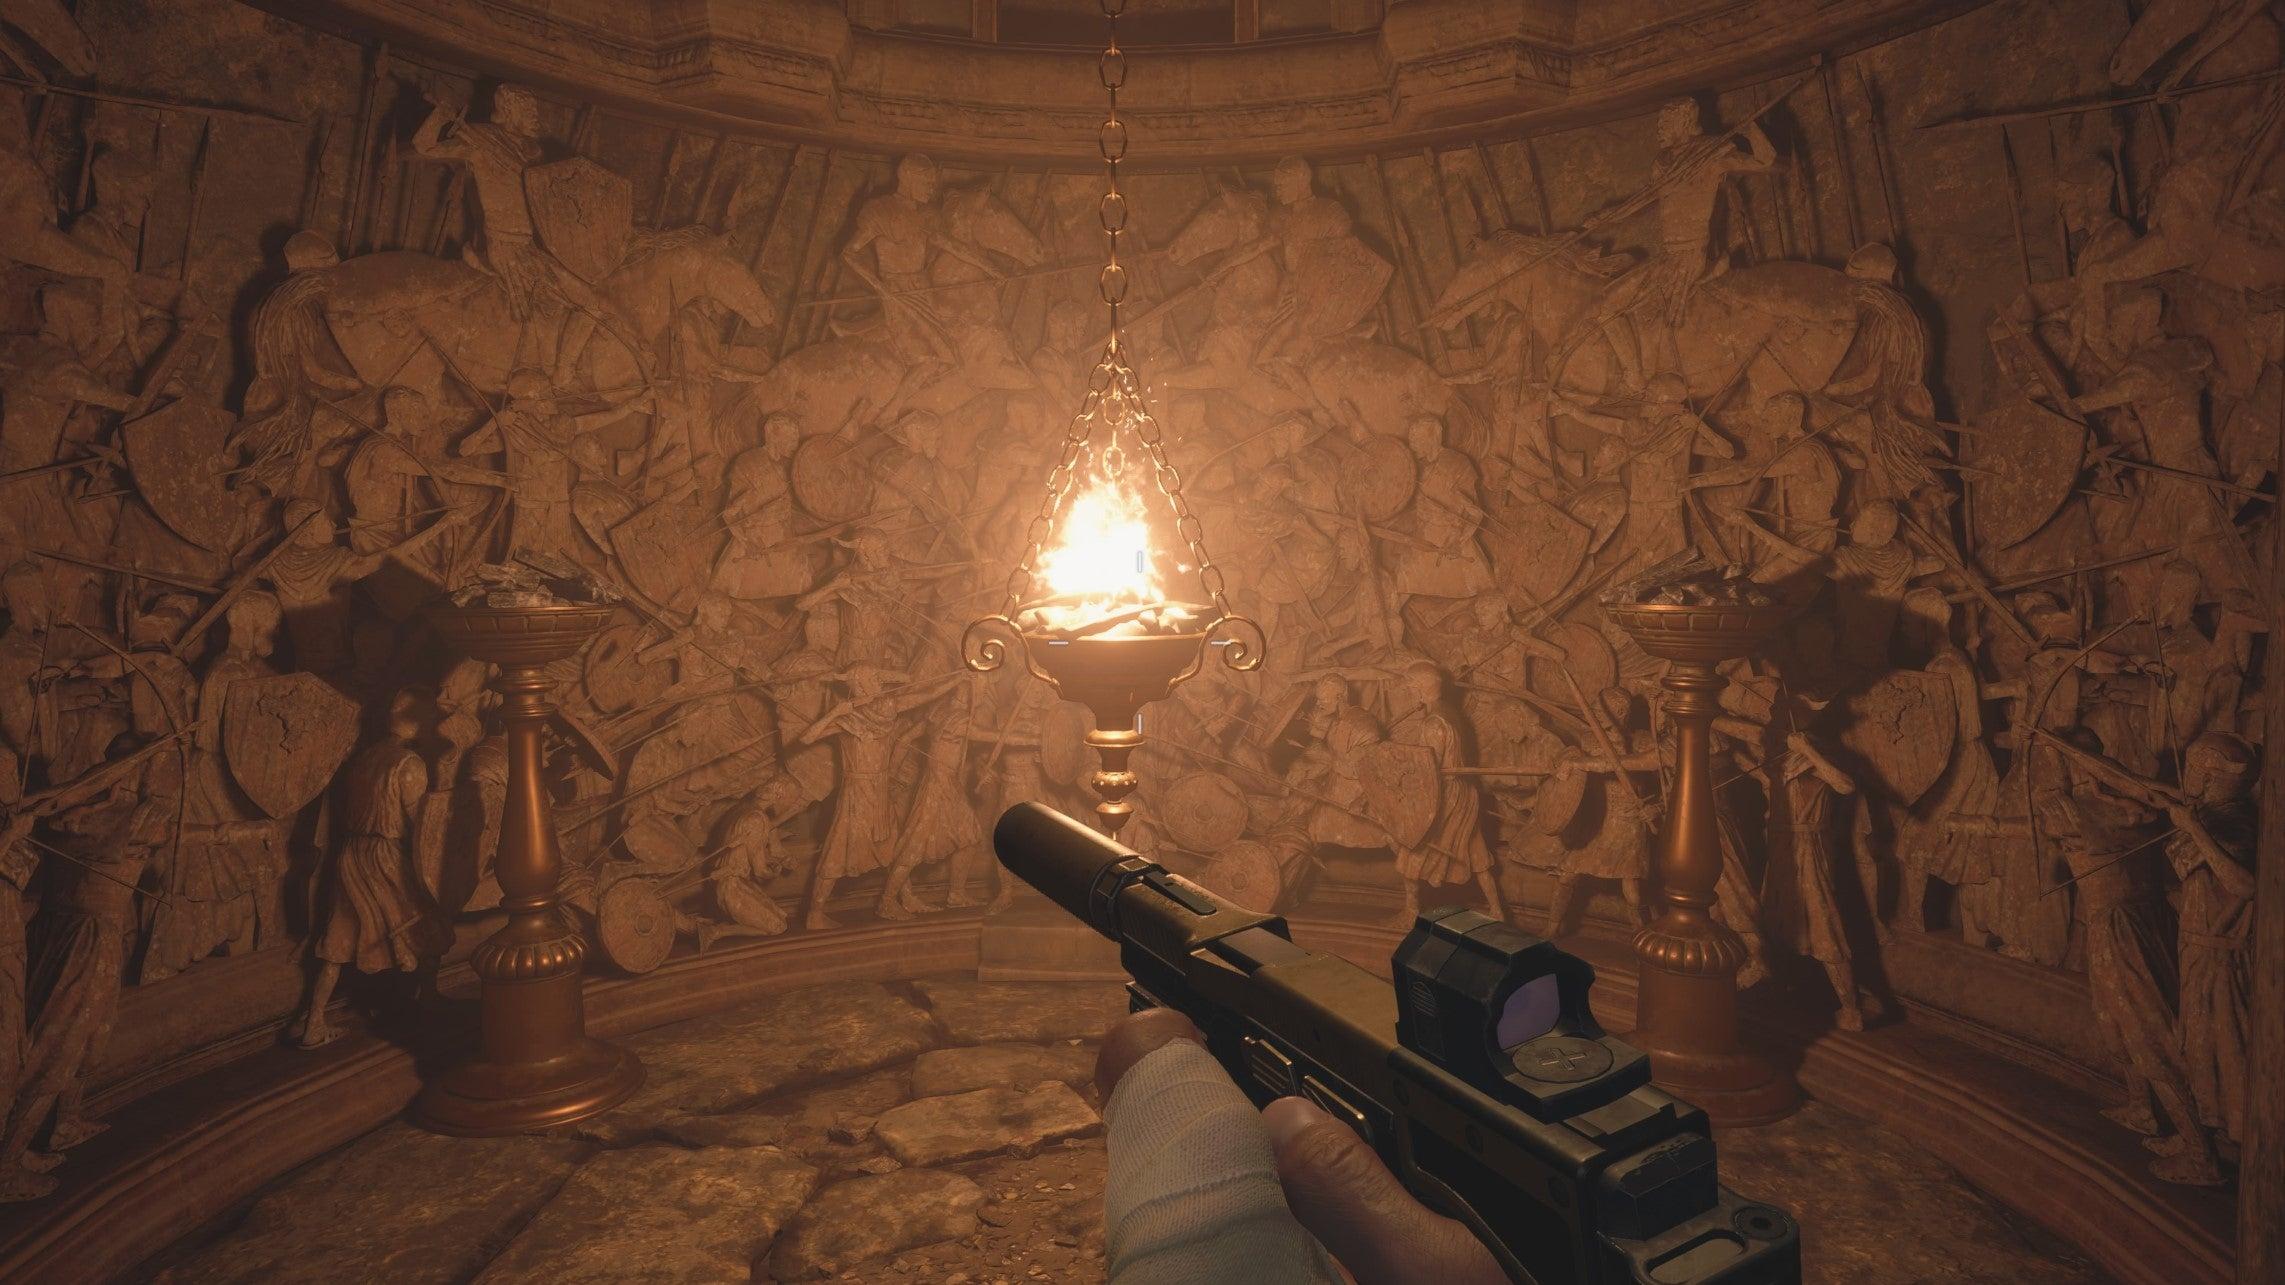 Image for Resident Evil Village Part 3 | Hall of War, Dungeon, Bela Dimitrescu First Daughter Boss